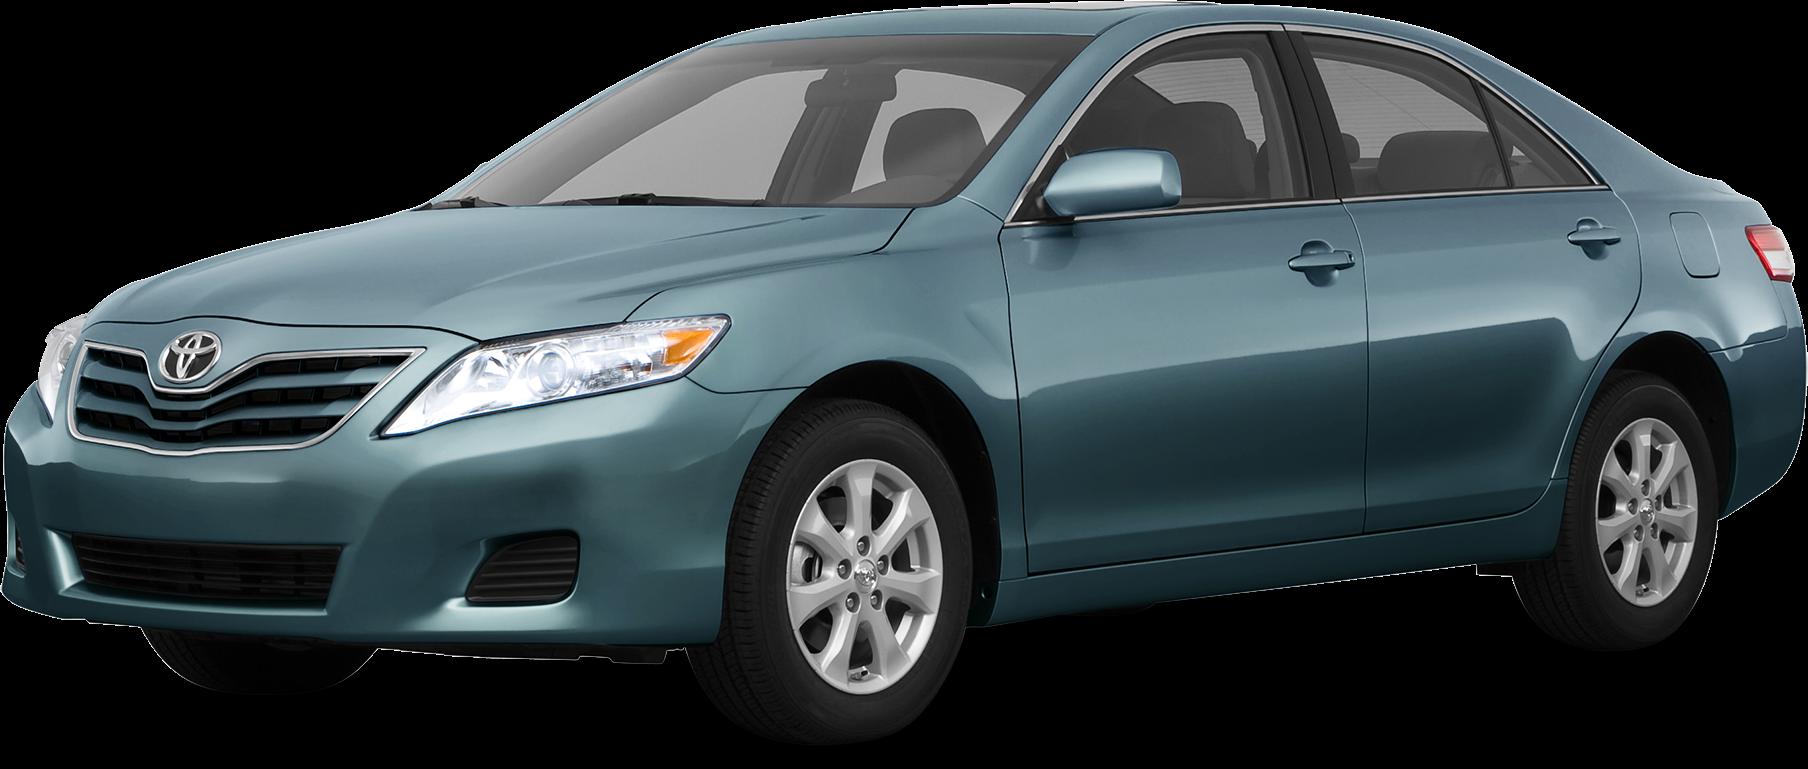 2011 Chevrolet Malibu   Pricing, Ratings, Expert Review   Kelley